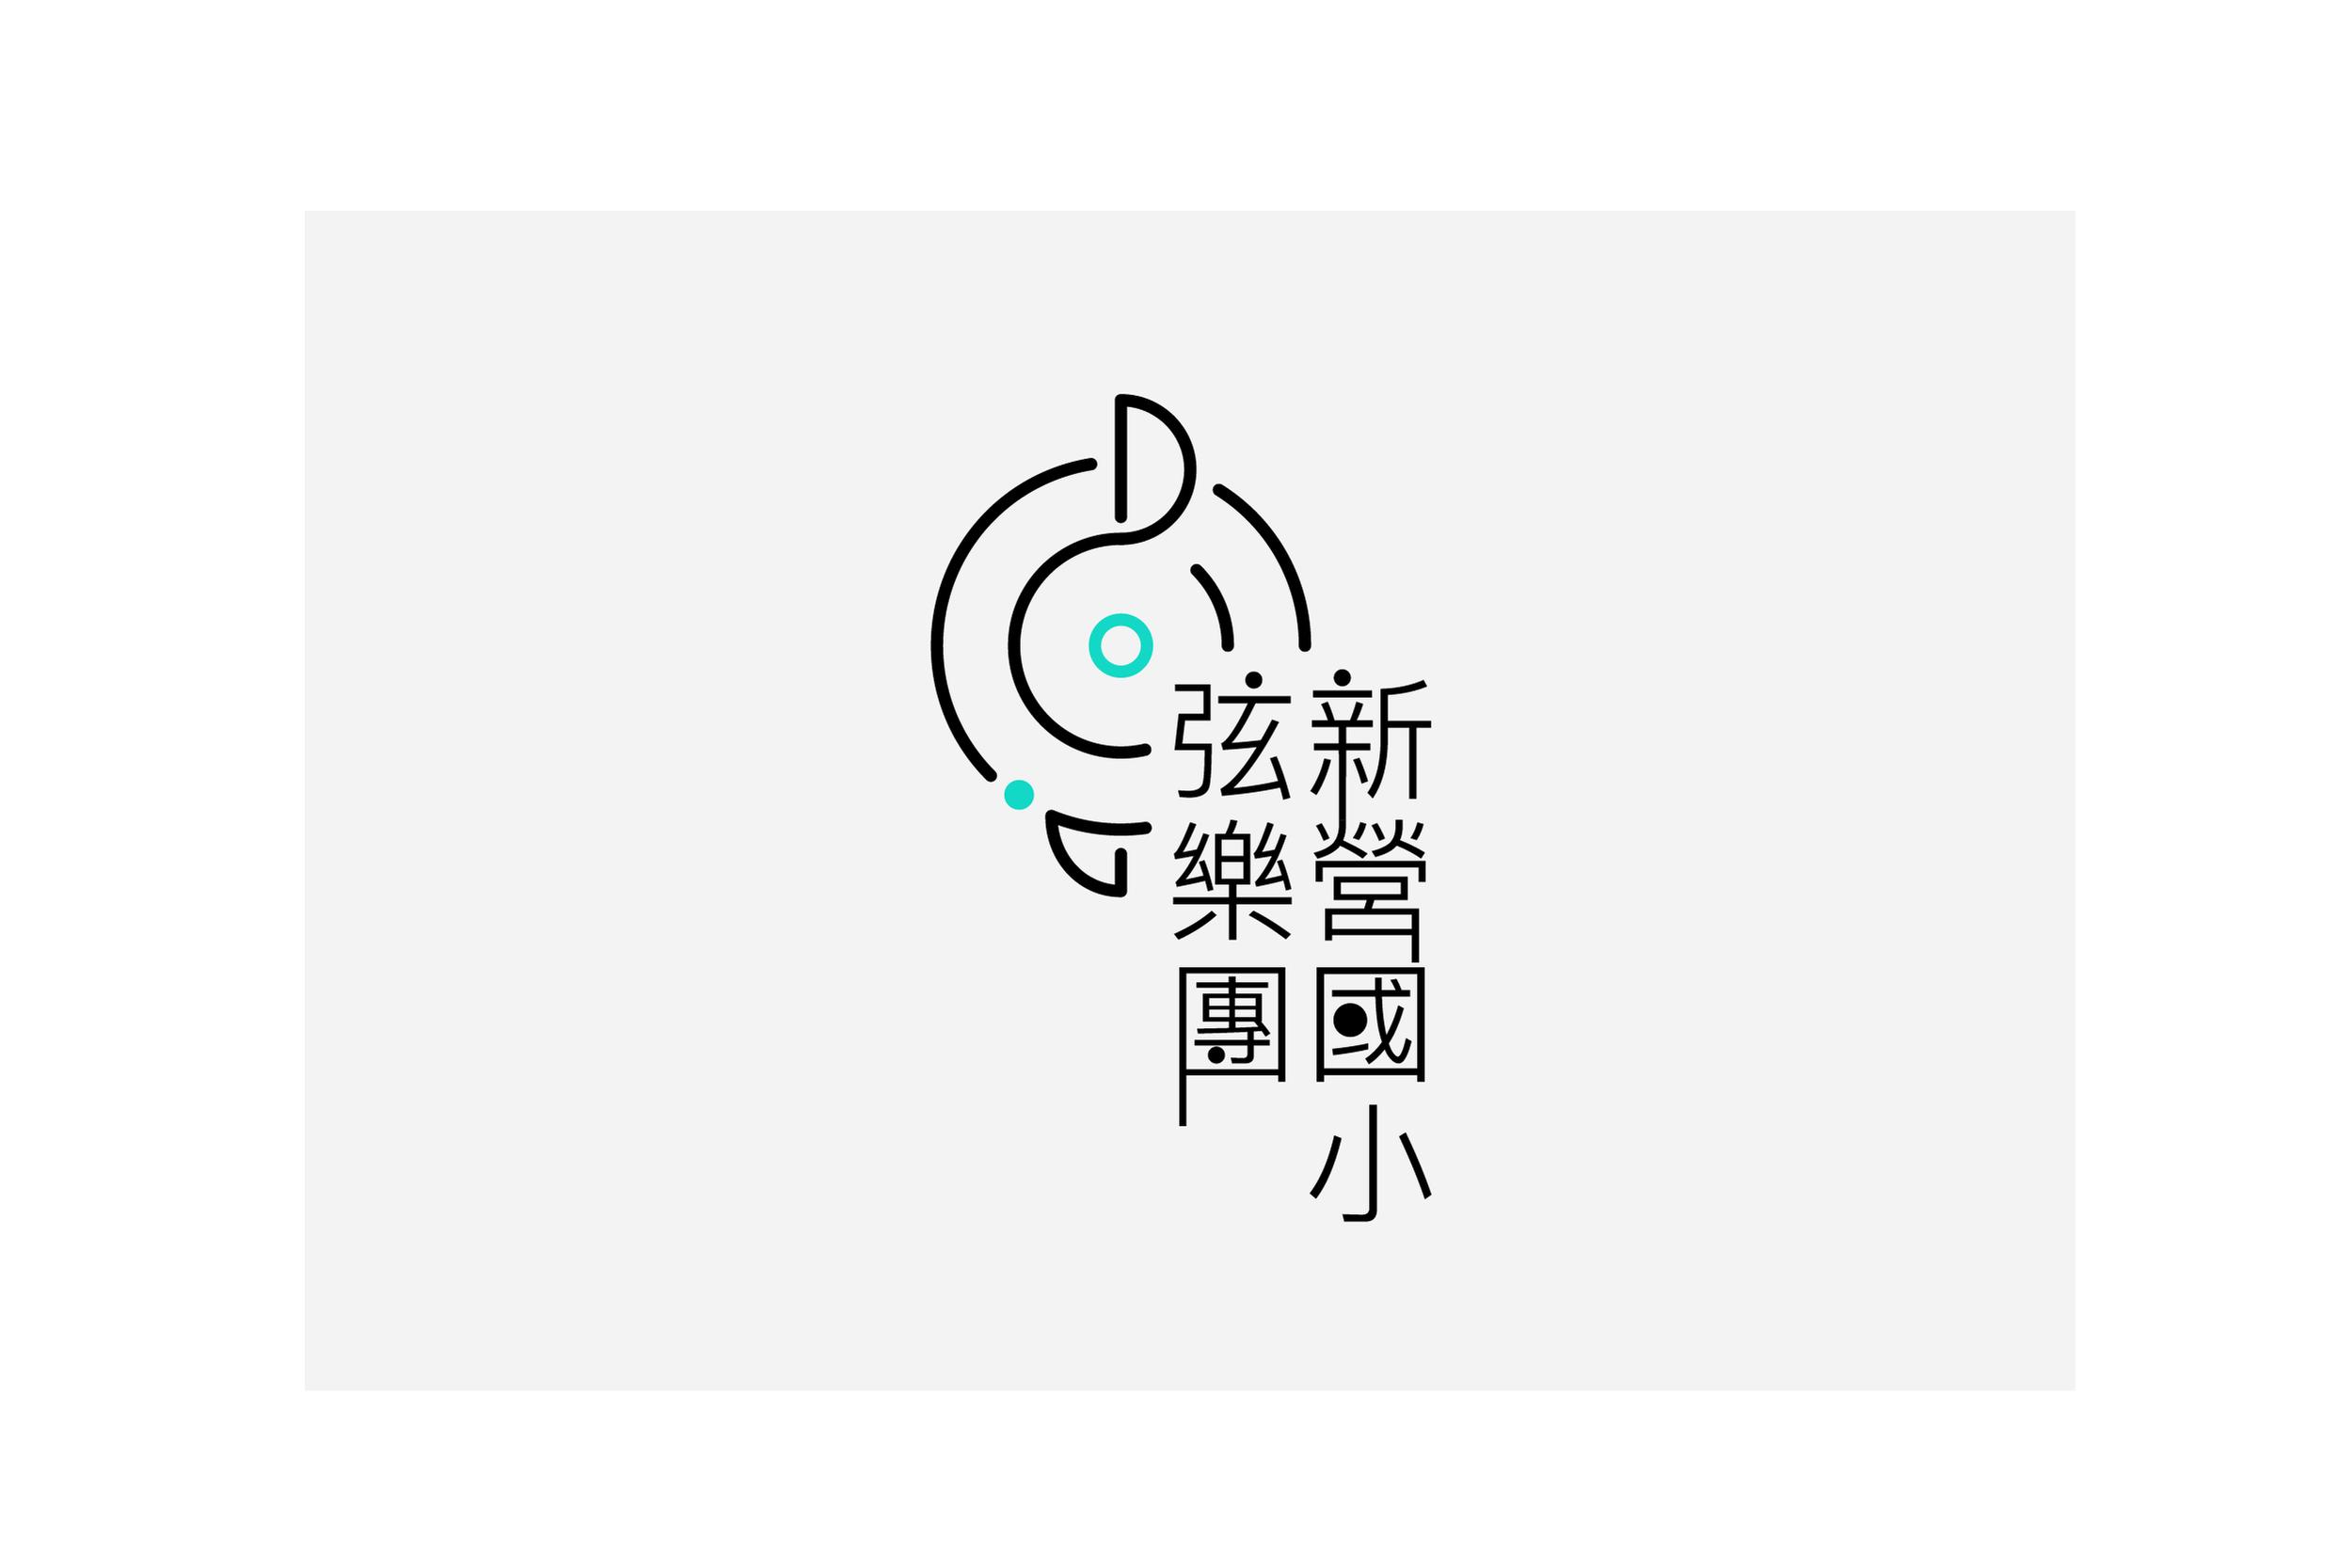 logos and marks_v4_Artboard 40.png